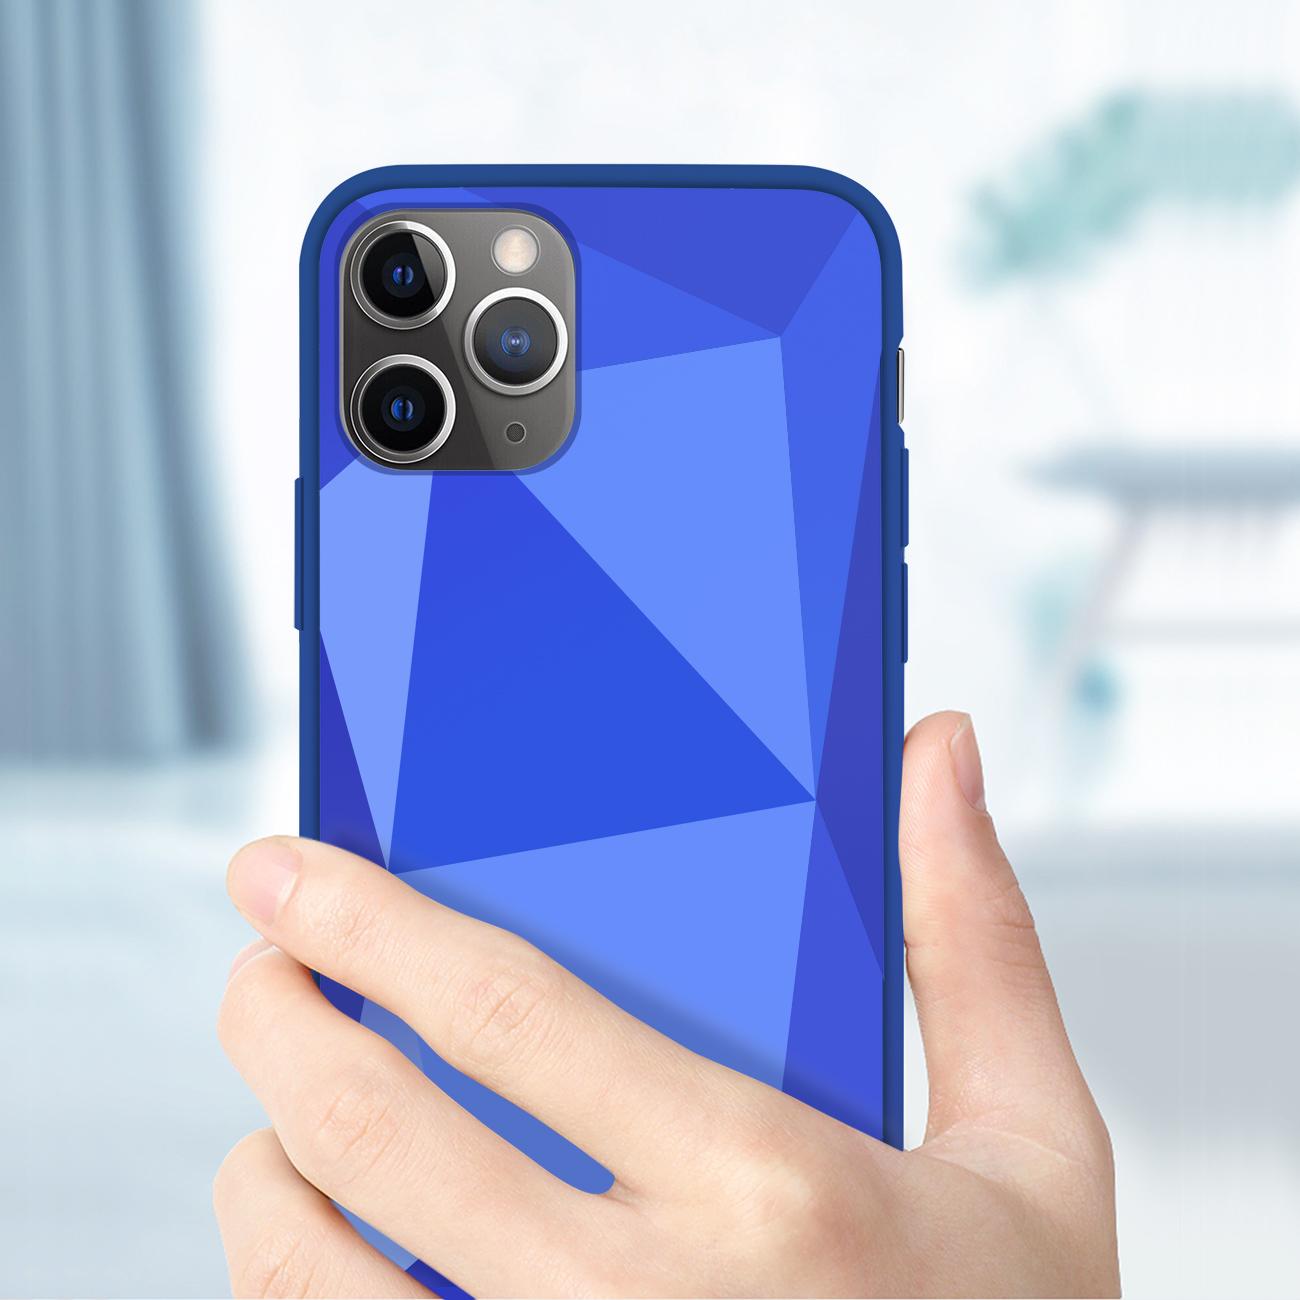 Apple iPhone 11 Pro Max Apple Diamond Cases In Blue